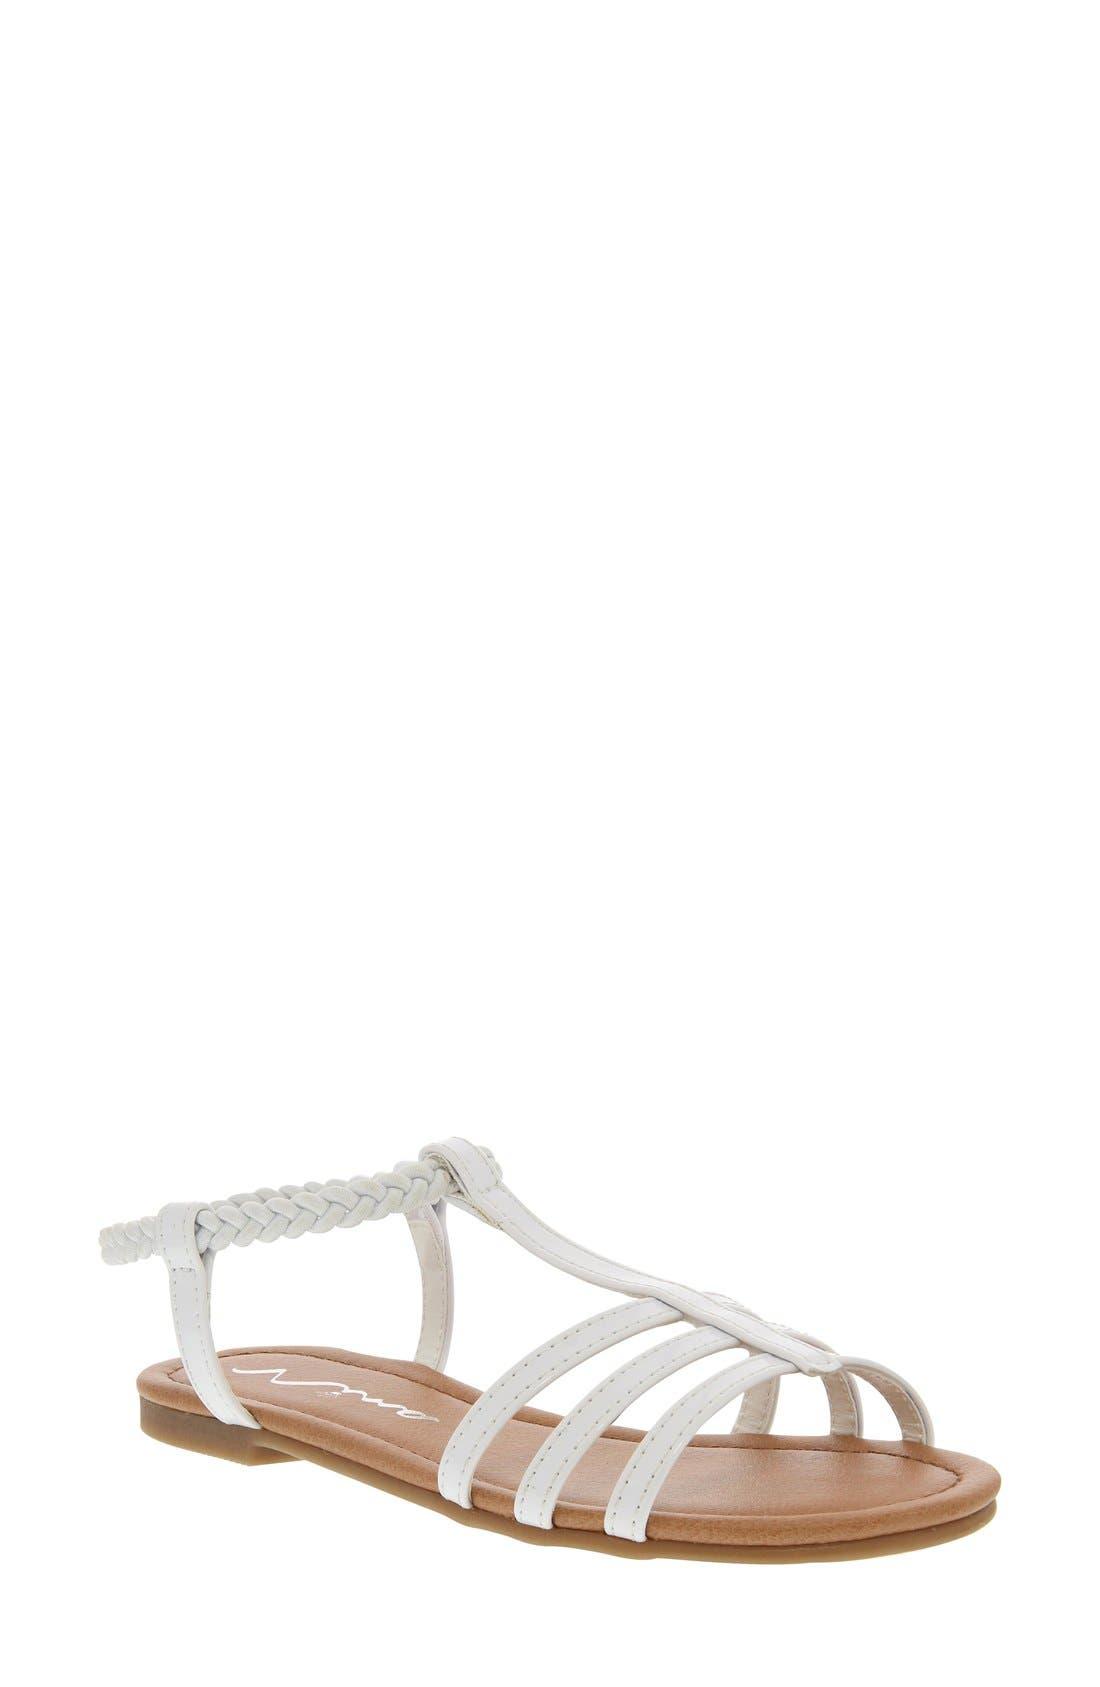 'Melvie' Sandal,                             Main thumbnail 1, color,                             WHITE